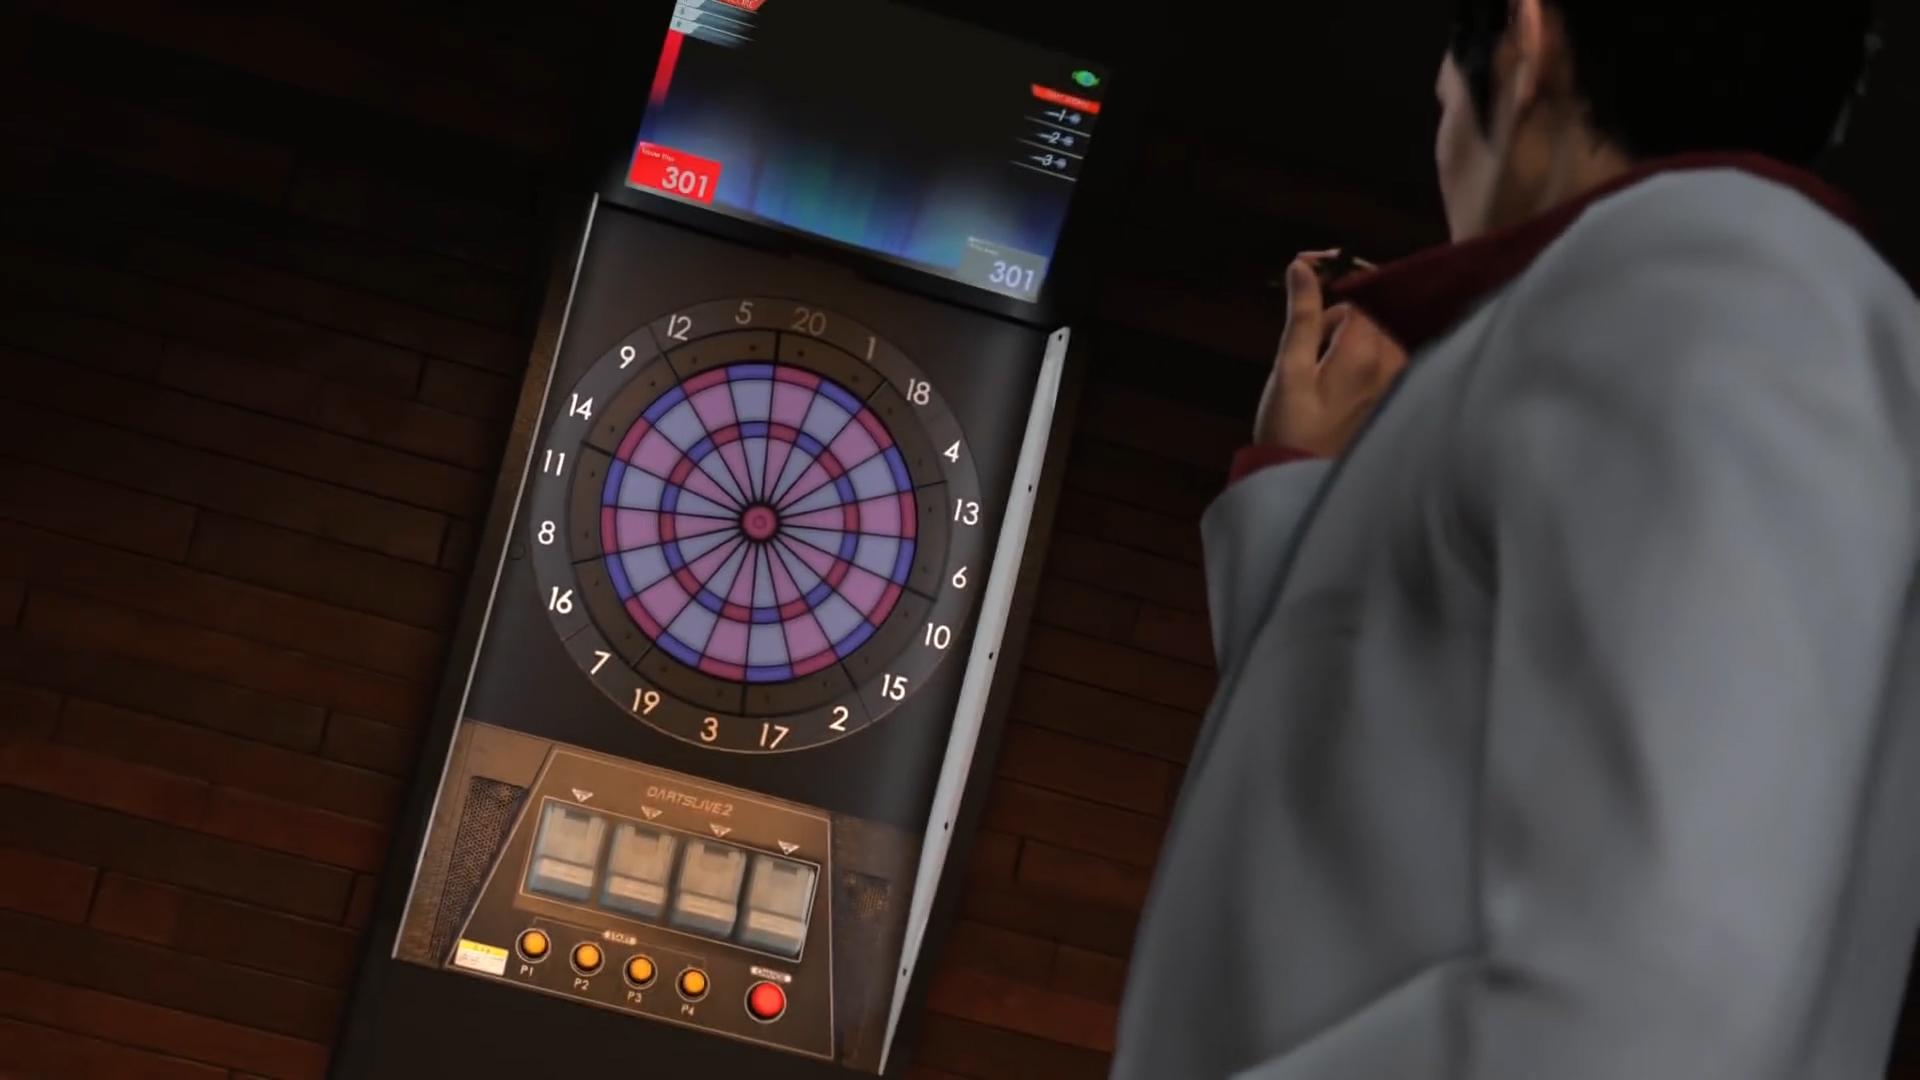 Yakuza 6 Minigames Trailer Shows Virtua Fighter 5